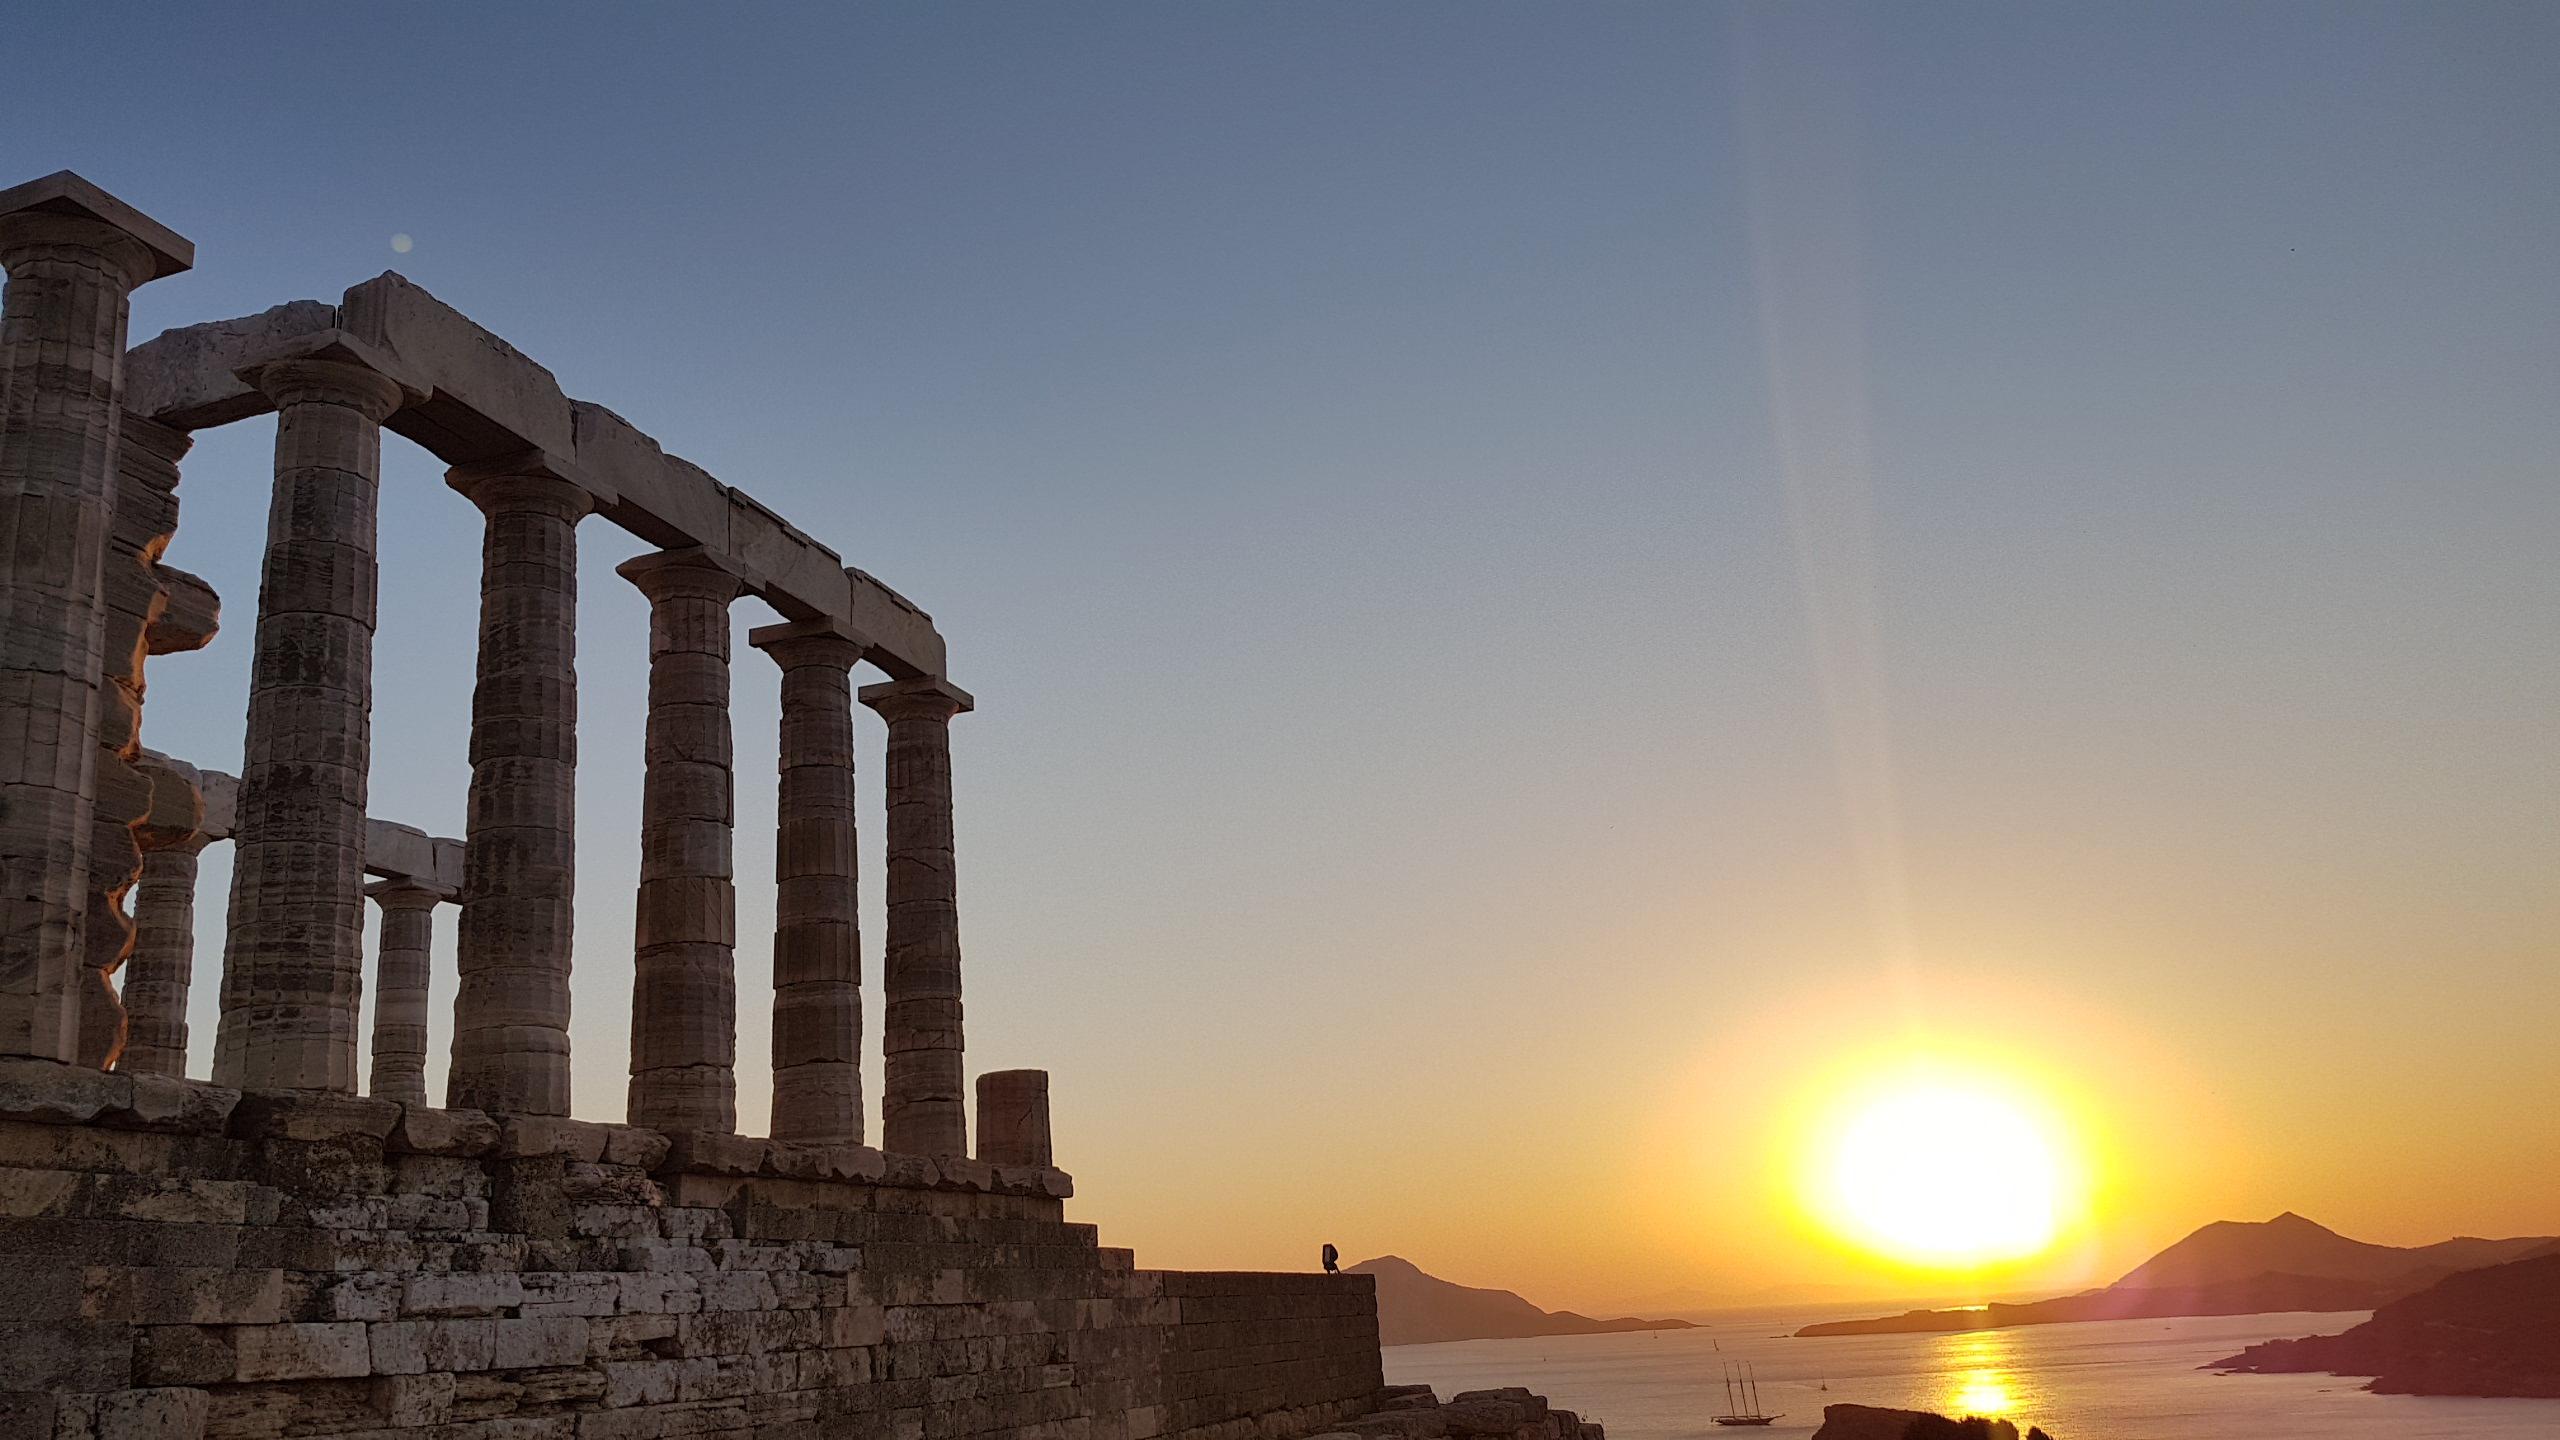 Athens Sounio, ruins, temple of Poseidon